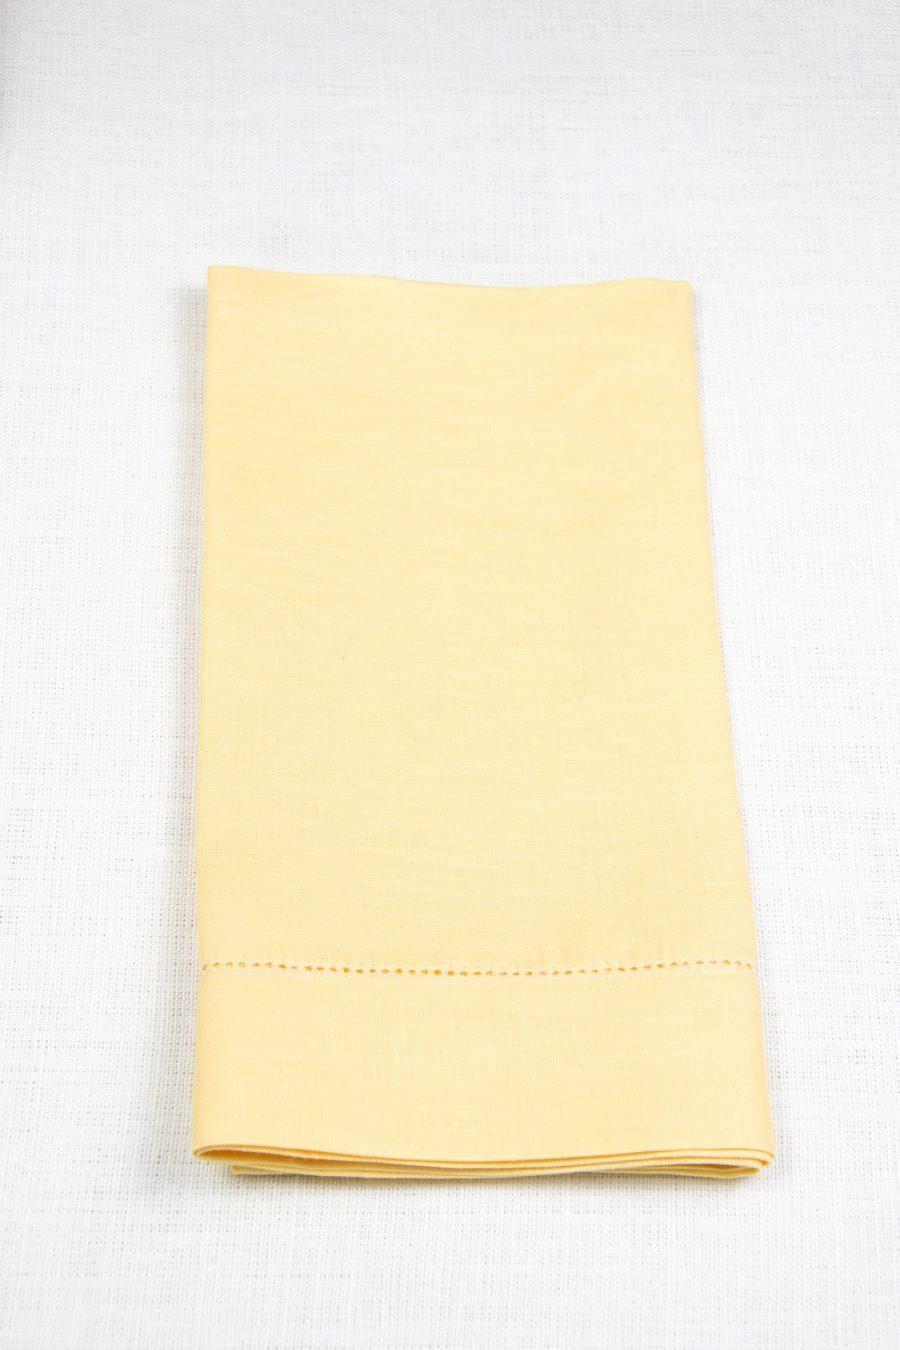 Napkin-French-Butter-900x1350.jpg